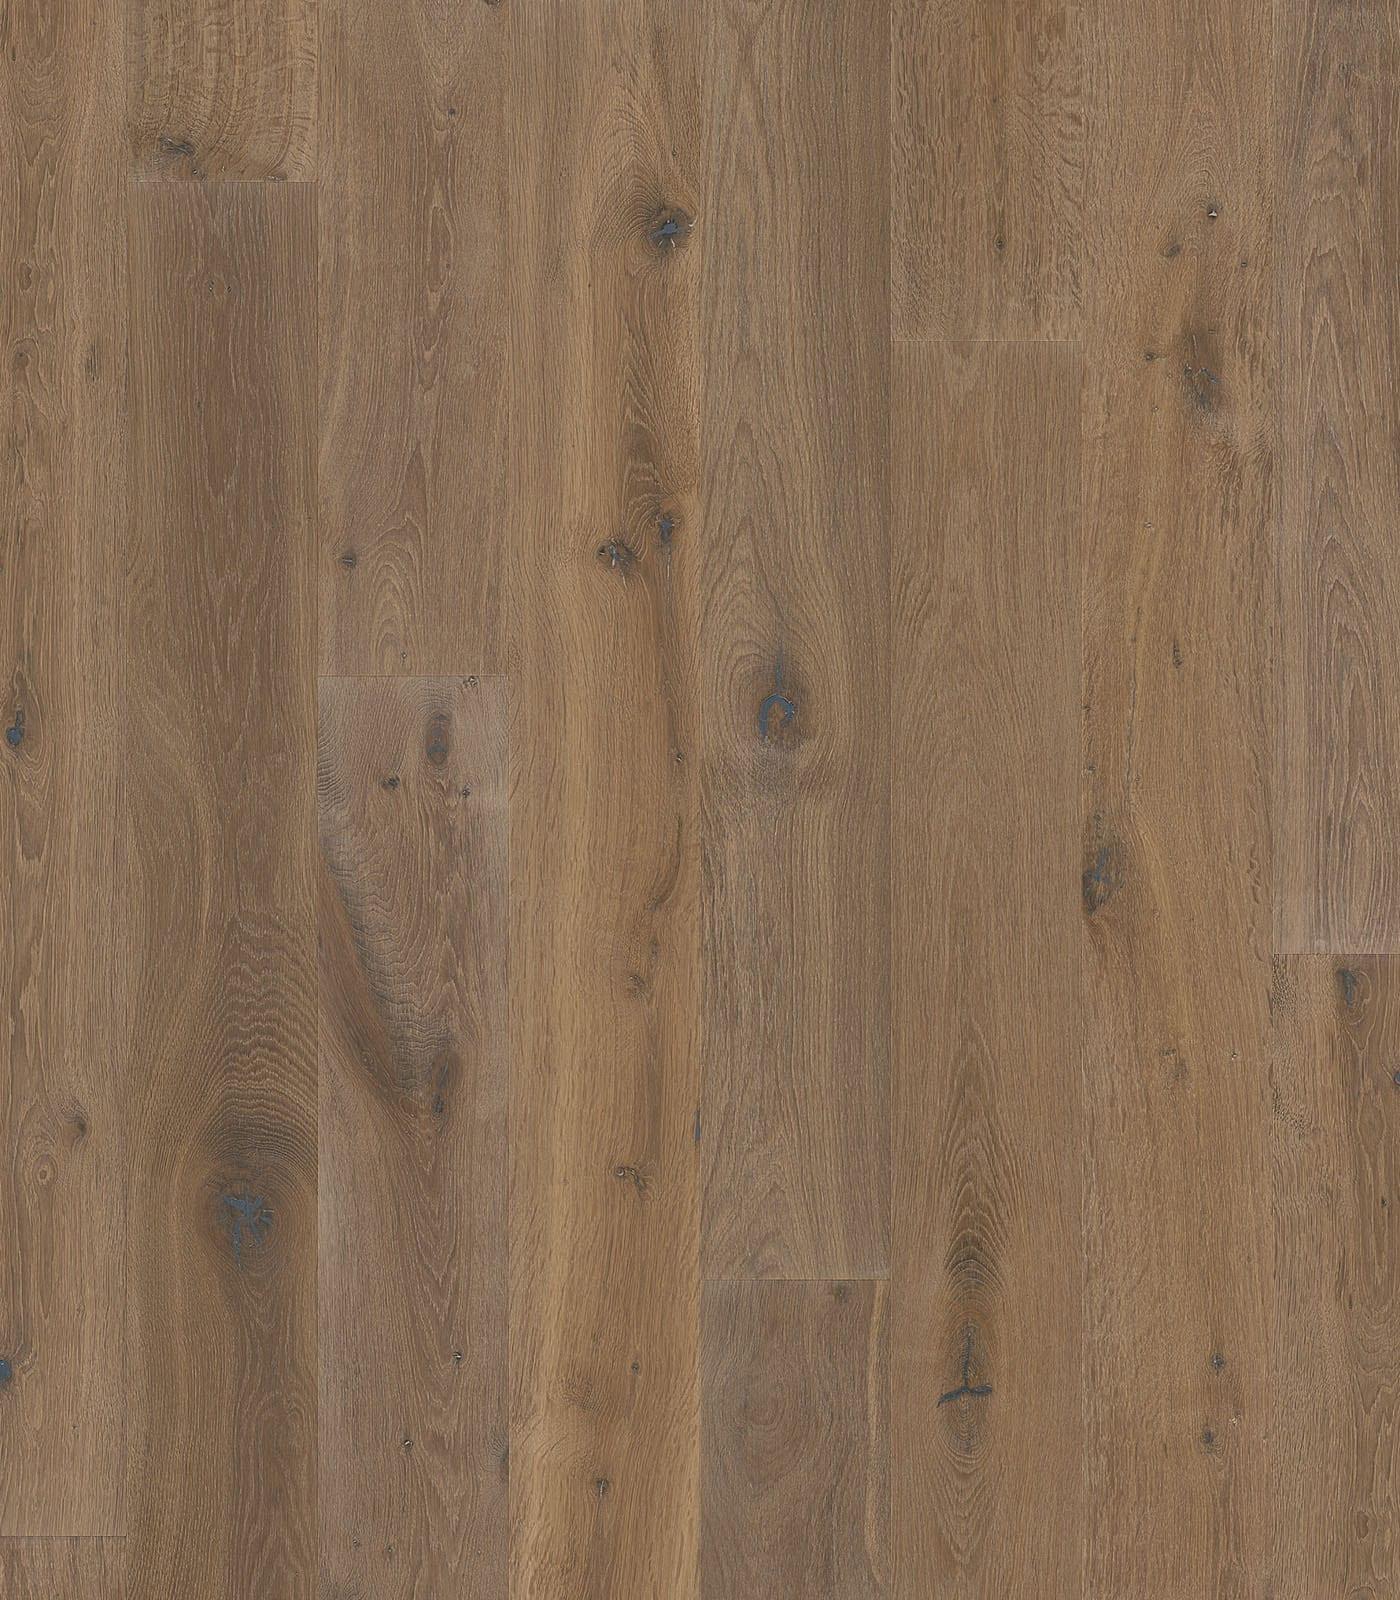 Anguilla-Lifestyle Collection-European Oak Floors-flat